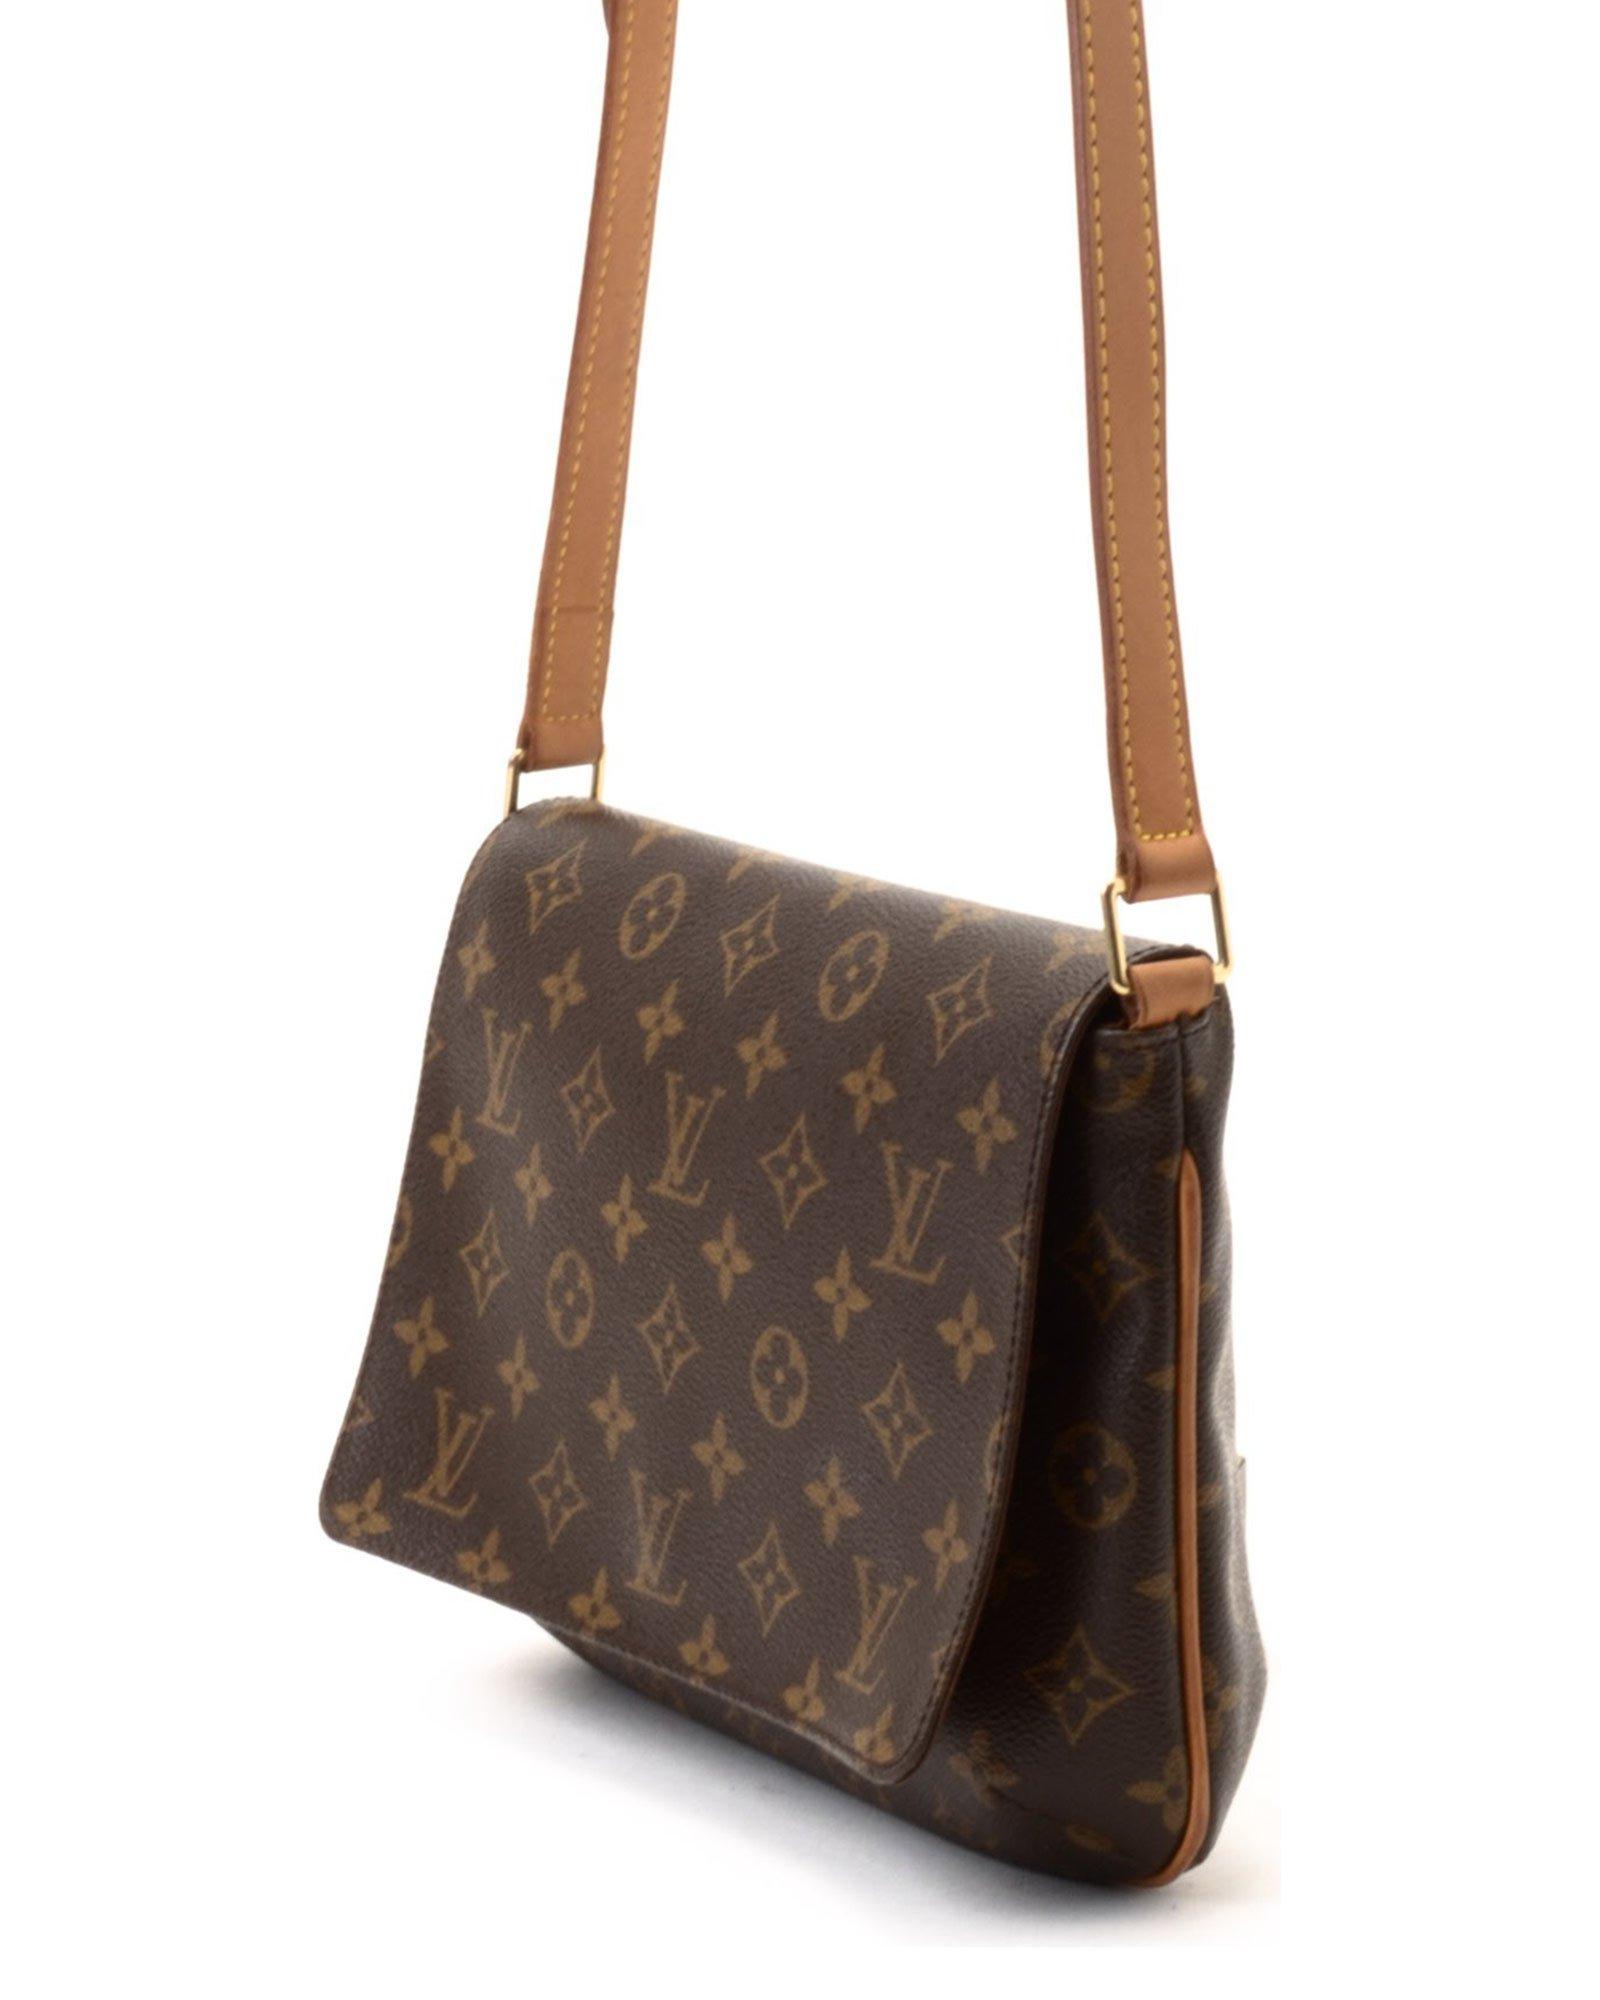 Lyst - Louis Vuitton Shoulder Bag - Vintage in Brown